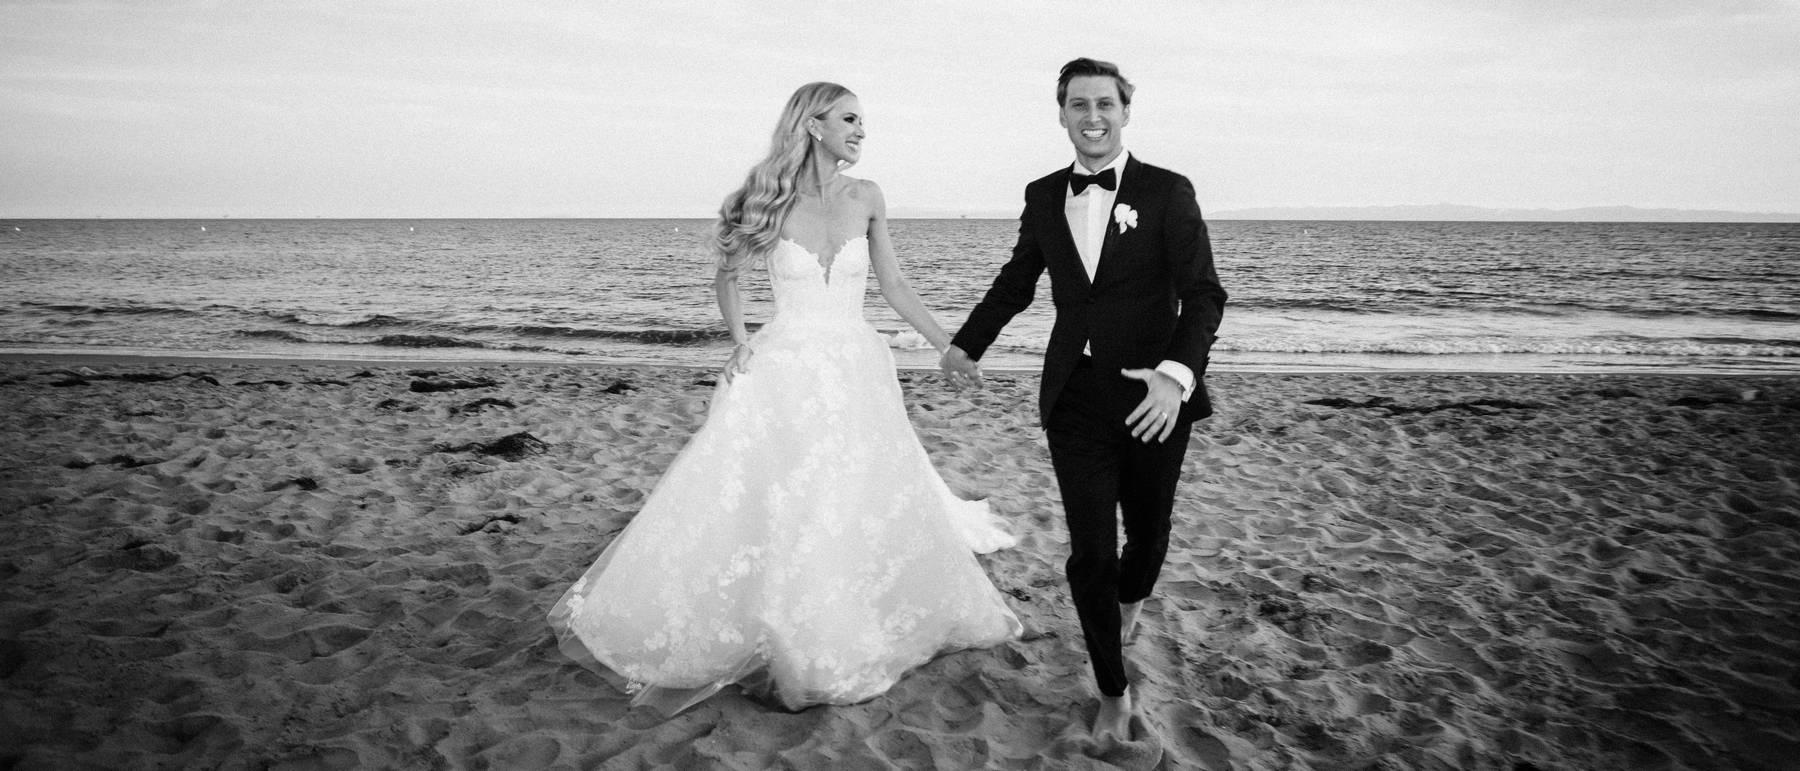 johnandjoseph-wedding-photographer-hz-slider-308